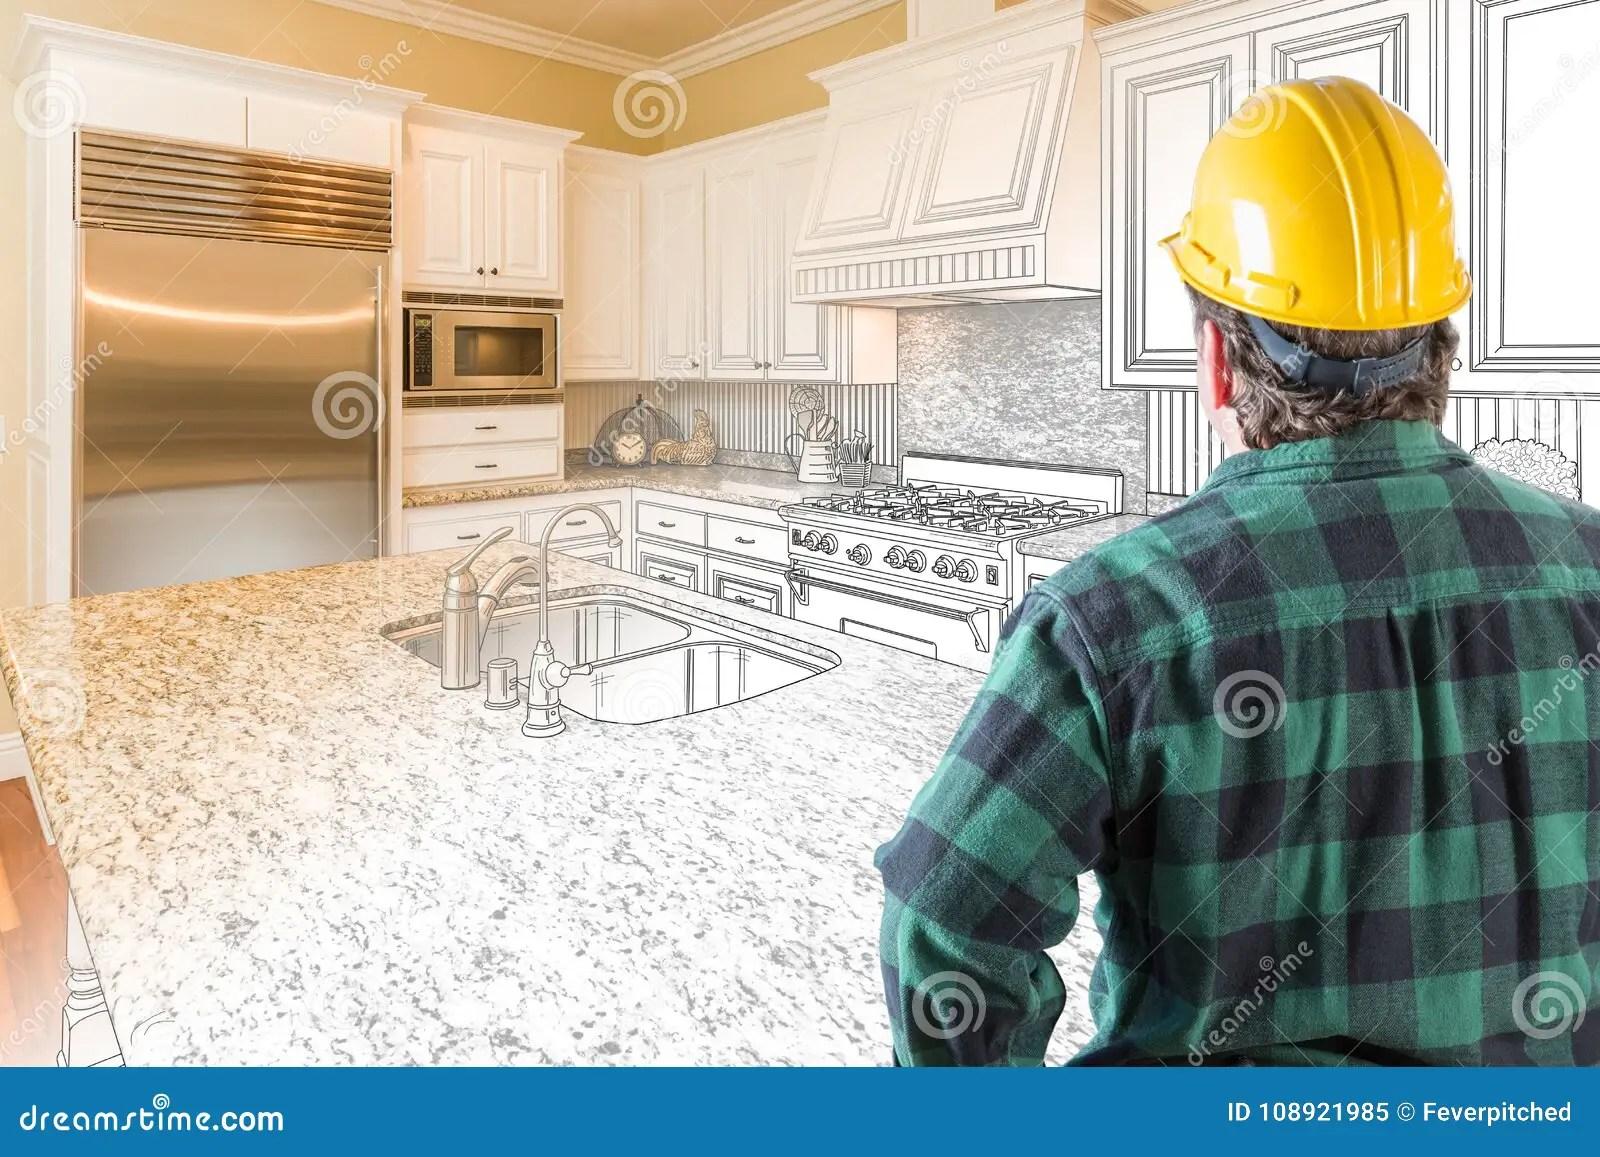 kitchen contractor gel mats for 与安全帽和工具传送带的公承包商看一个厨房库存例证 插画包括有布琼布拉 与安全帽和工具传送带的公承包商看一个厨房